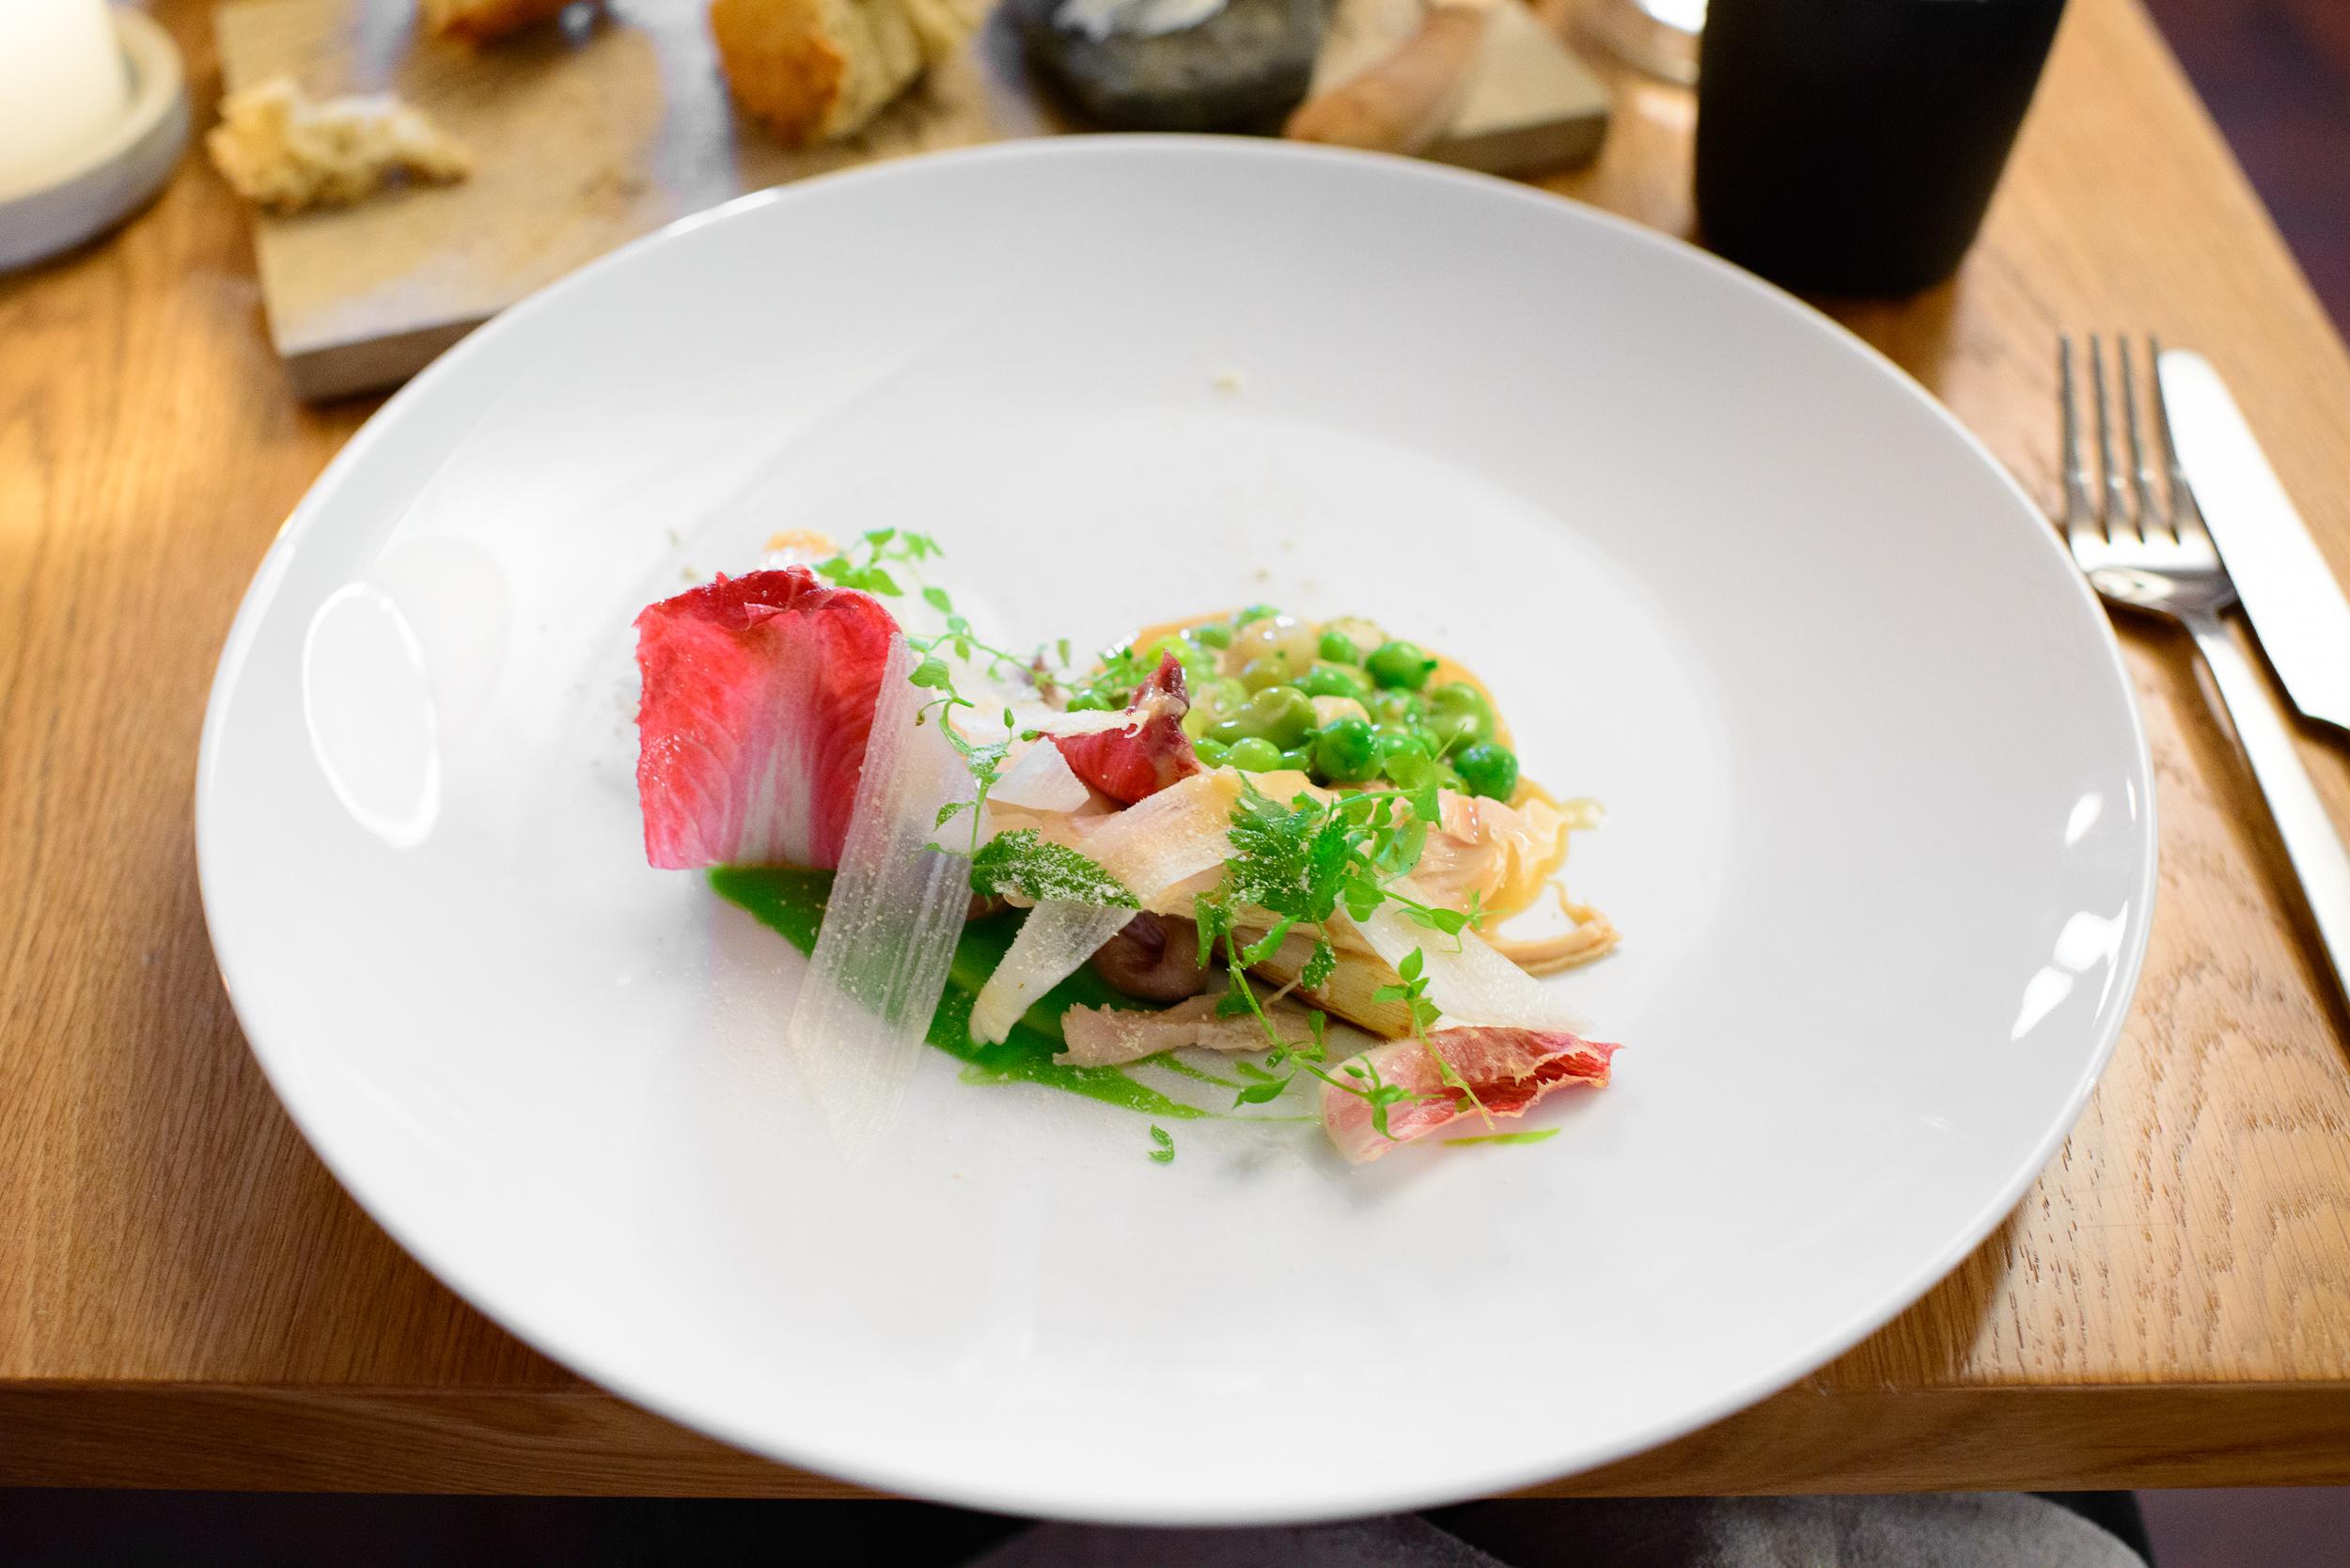 5th Course: Bornholm cockerel, white asparagus, mint, peas